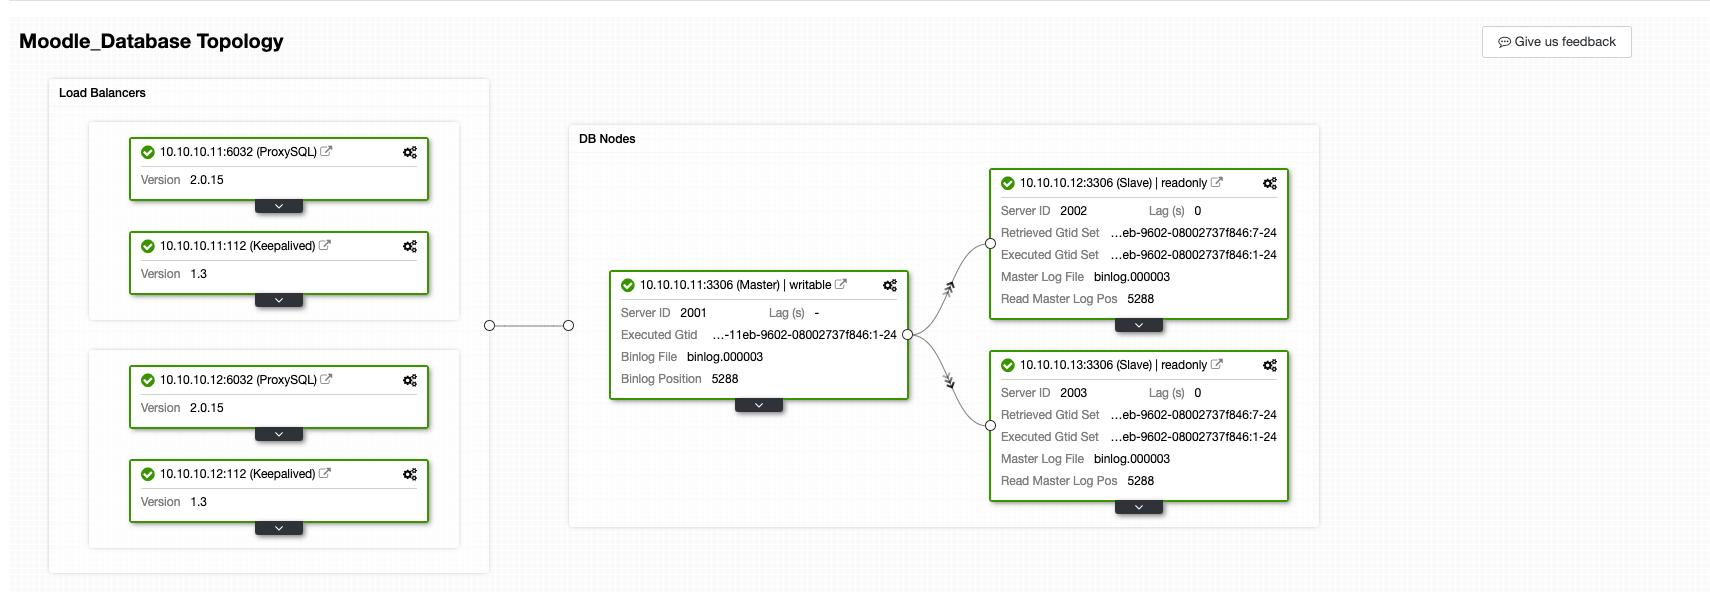 Moodle Clustered Database